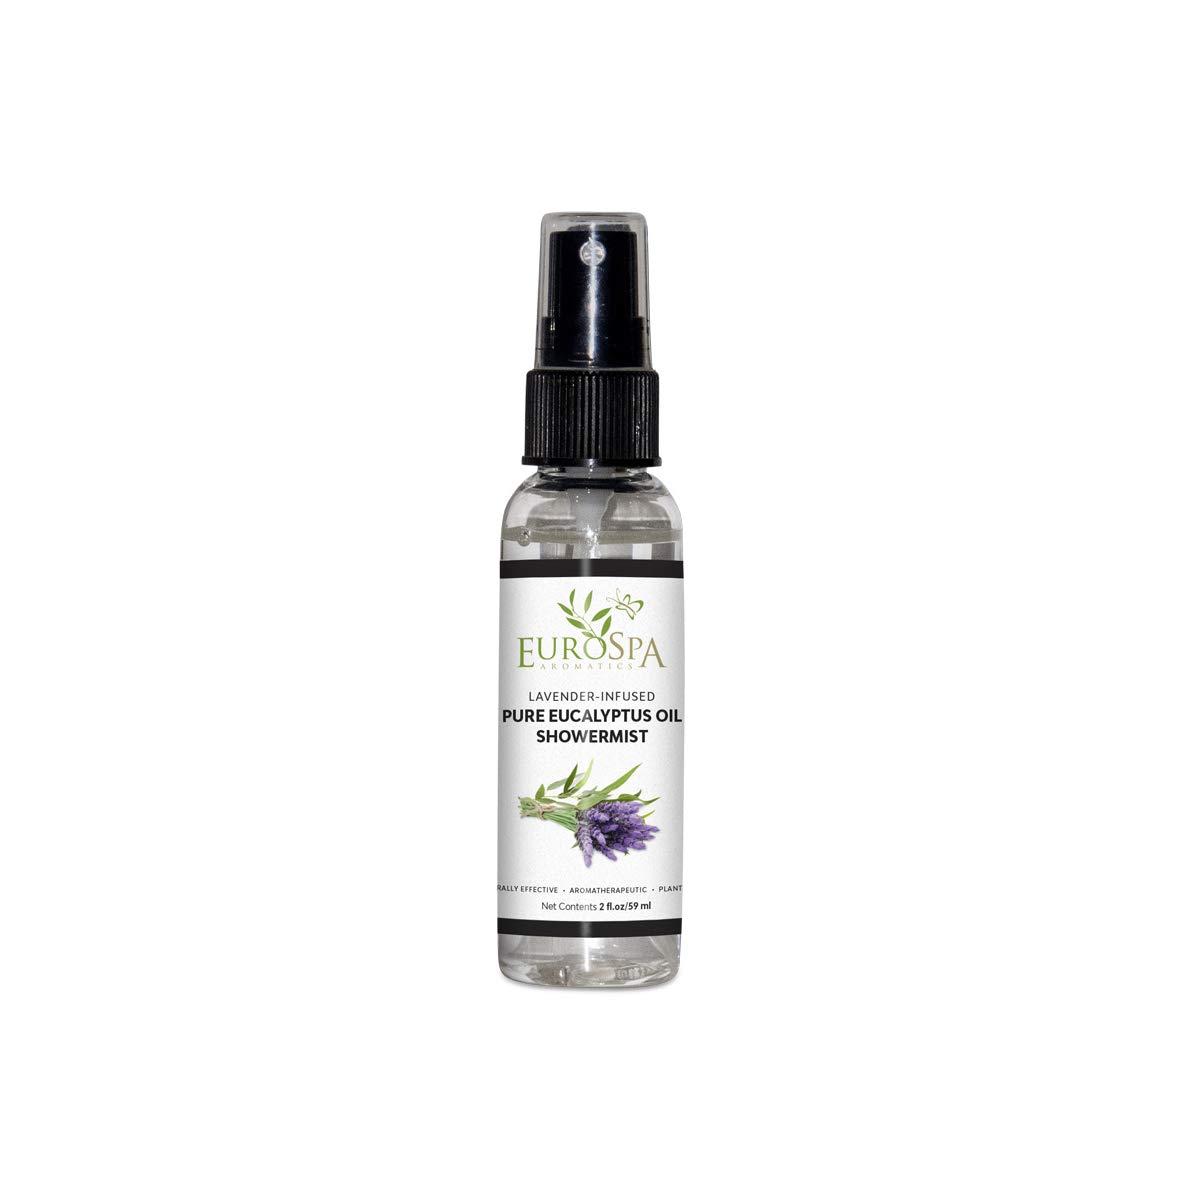 EuroSpa Aromatics Pure Eucalyptus Oil ShowerMist and Steam Room Spray, All-Natural Premium Aromatherapy Essential Oils - Lavender Infused, 2oz by EuroSpa Aromatics